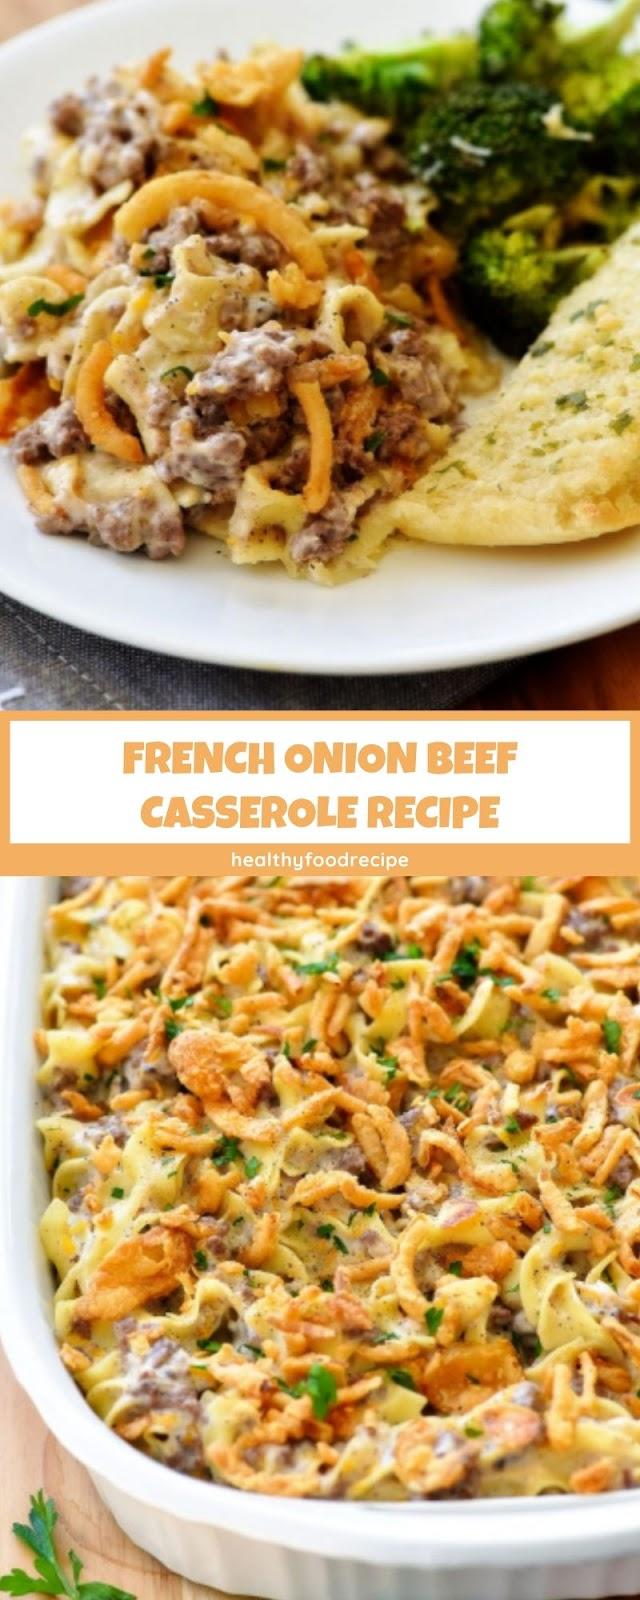 French Onion Beef Casserole Recipe In 2020 Beef Casserole Recipes French Onion Beef Casserole